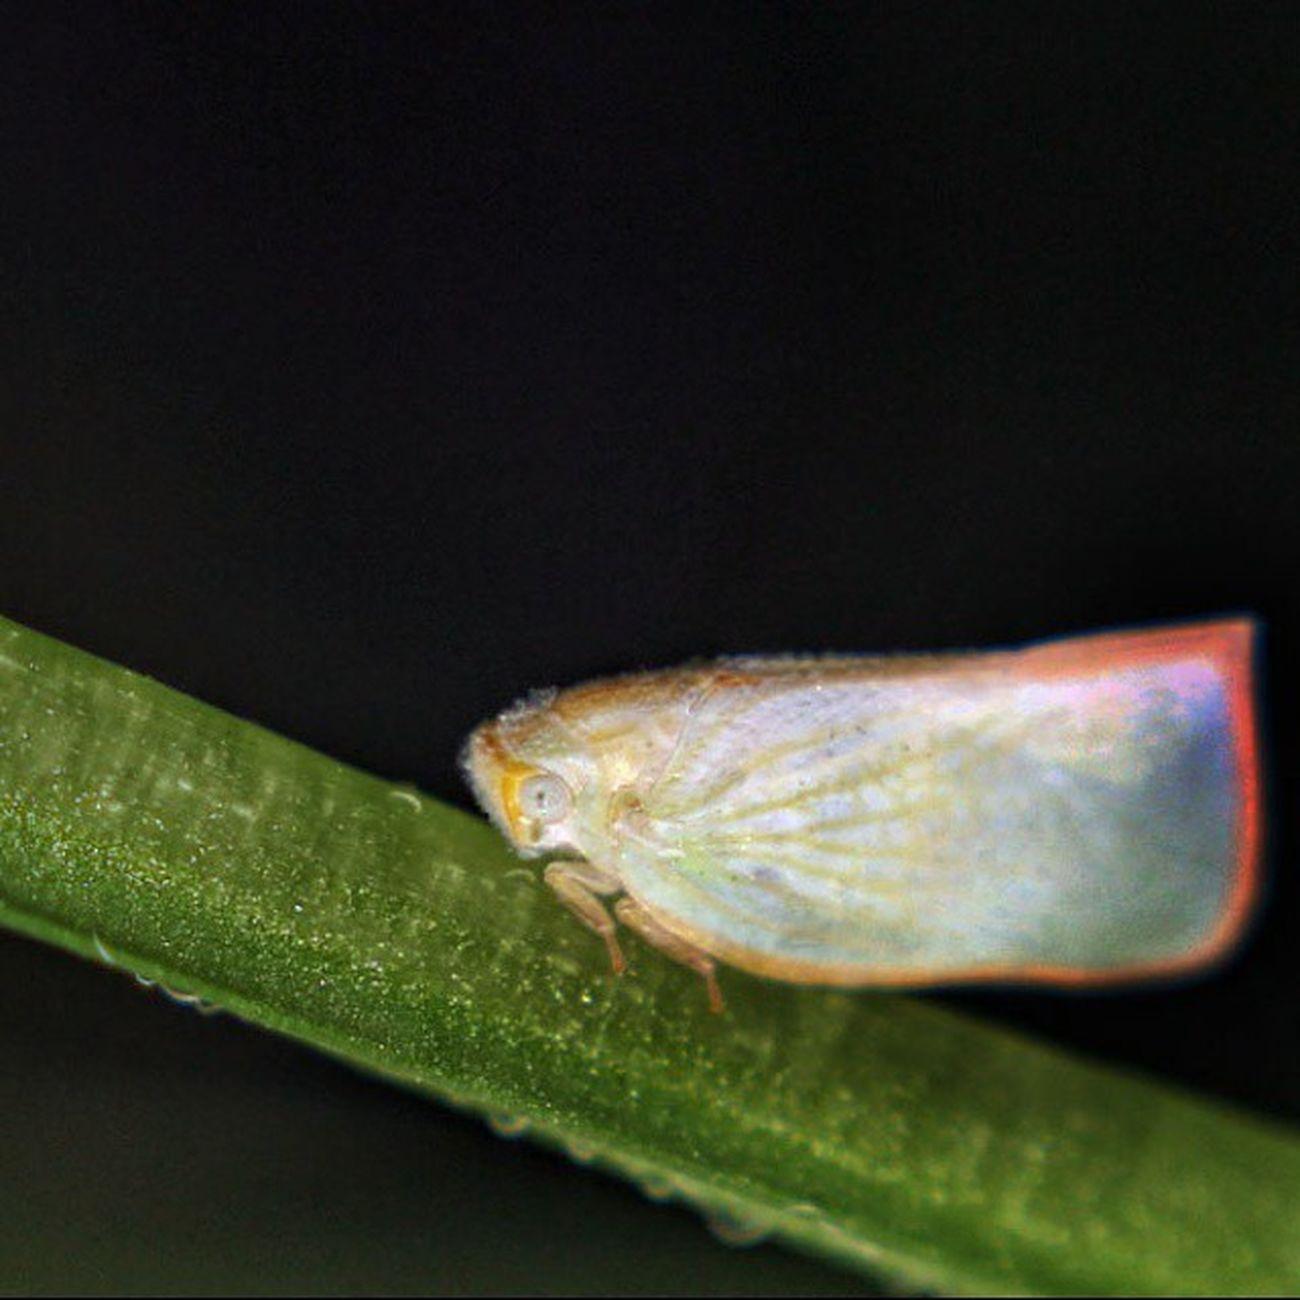 Kupu-kupu kepala ikan? Butterfly Kupukupu Closeup Macrophotography macro insectagram insect instagaruda_macro indonesiagram macro_x instagallery_ina